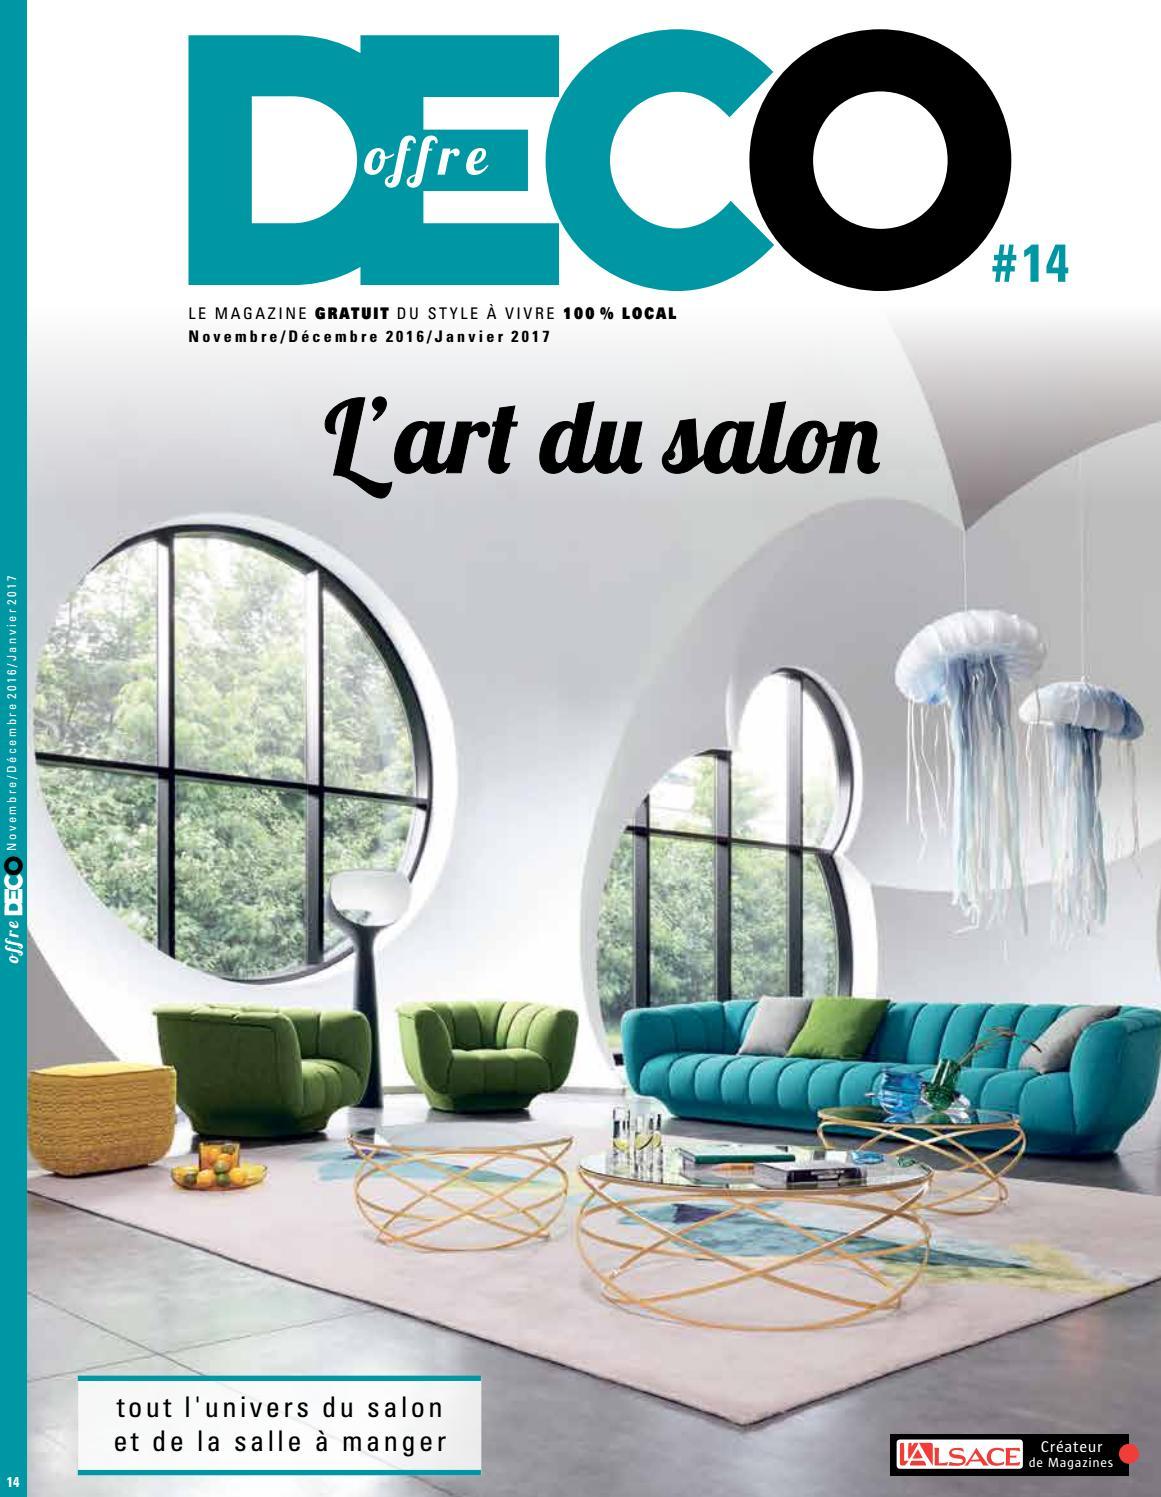 fre Déco 14 by julie rosenblatt issuu